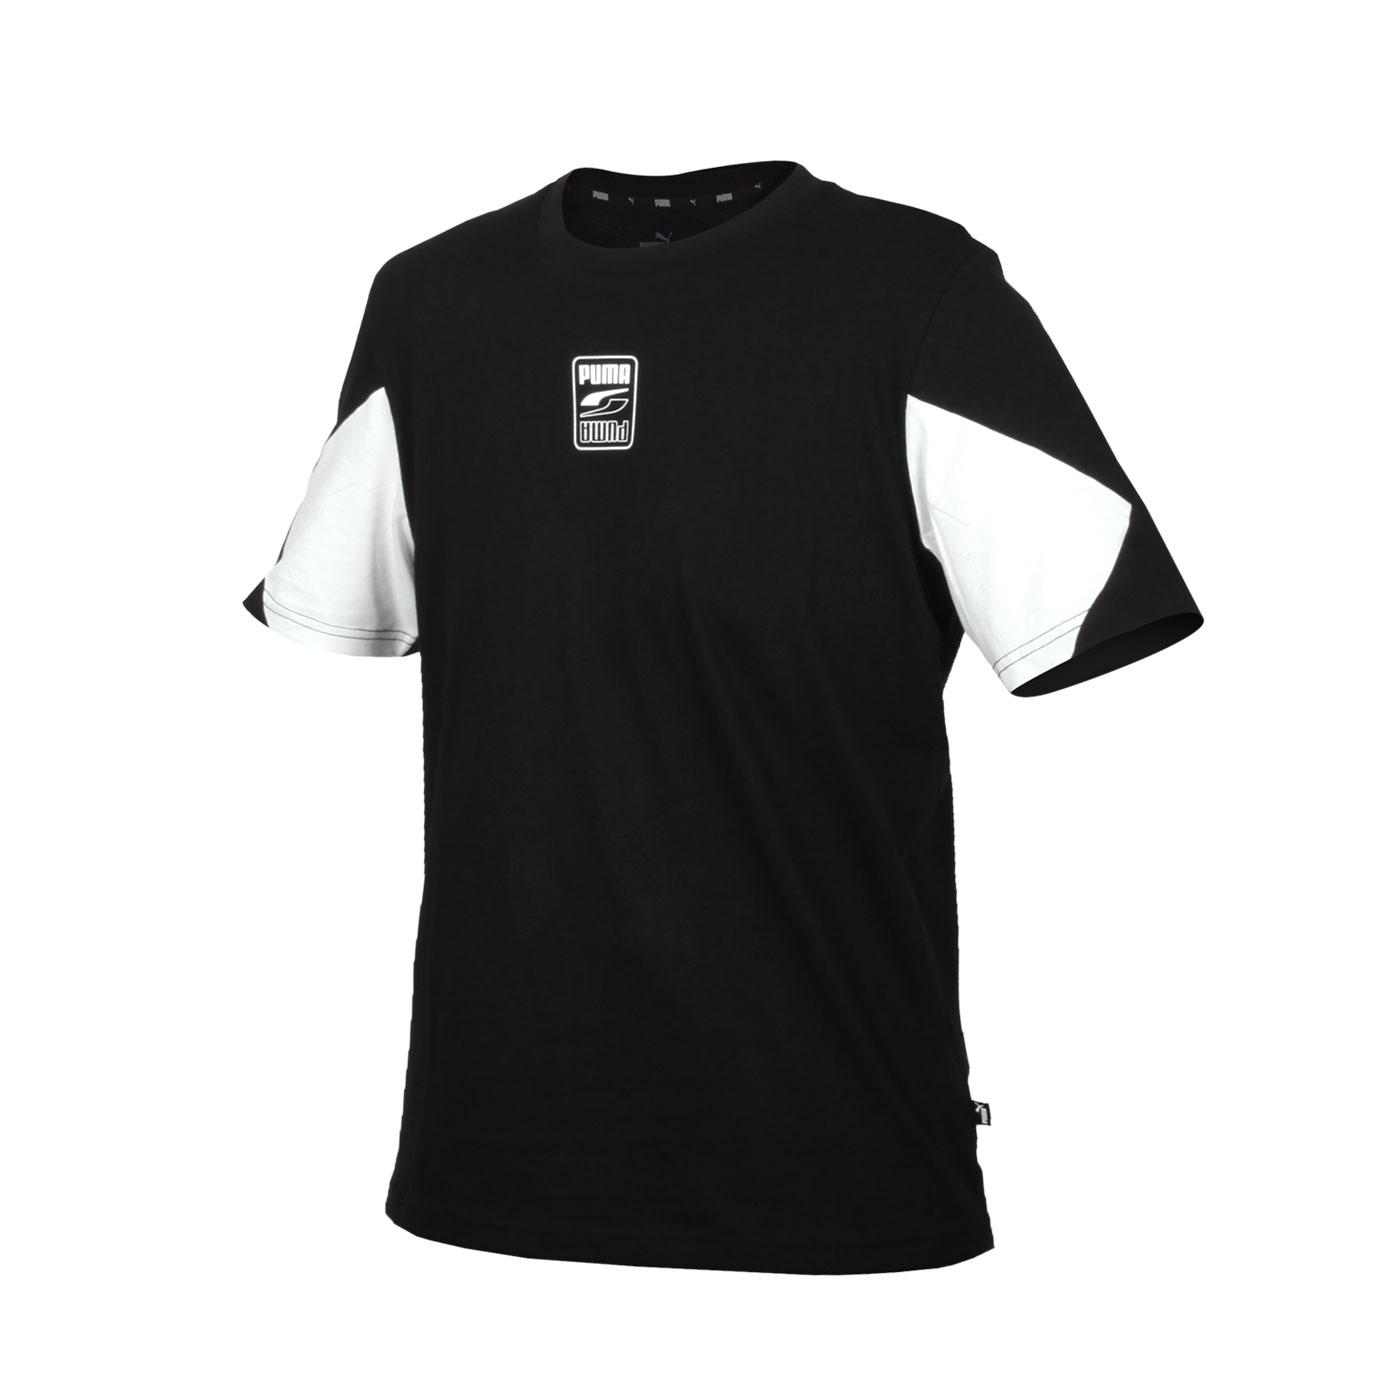 PUMA 男款基本系列拚色短袖T恤 58658801 - 黑白